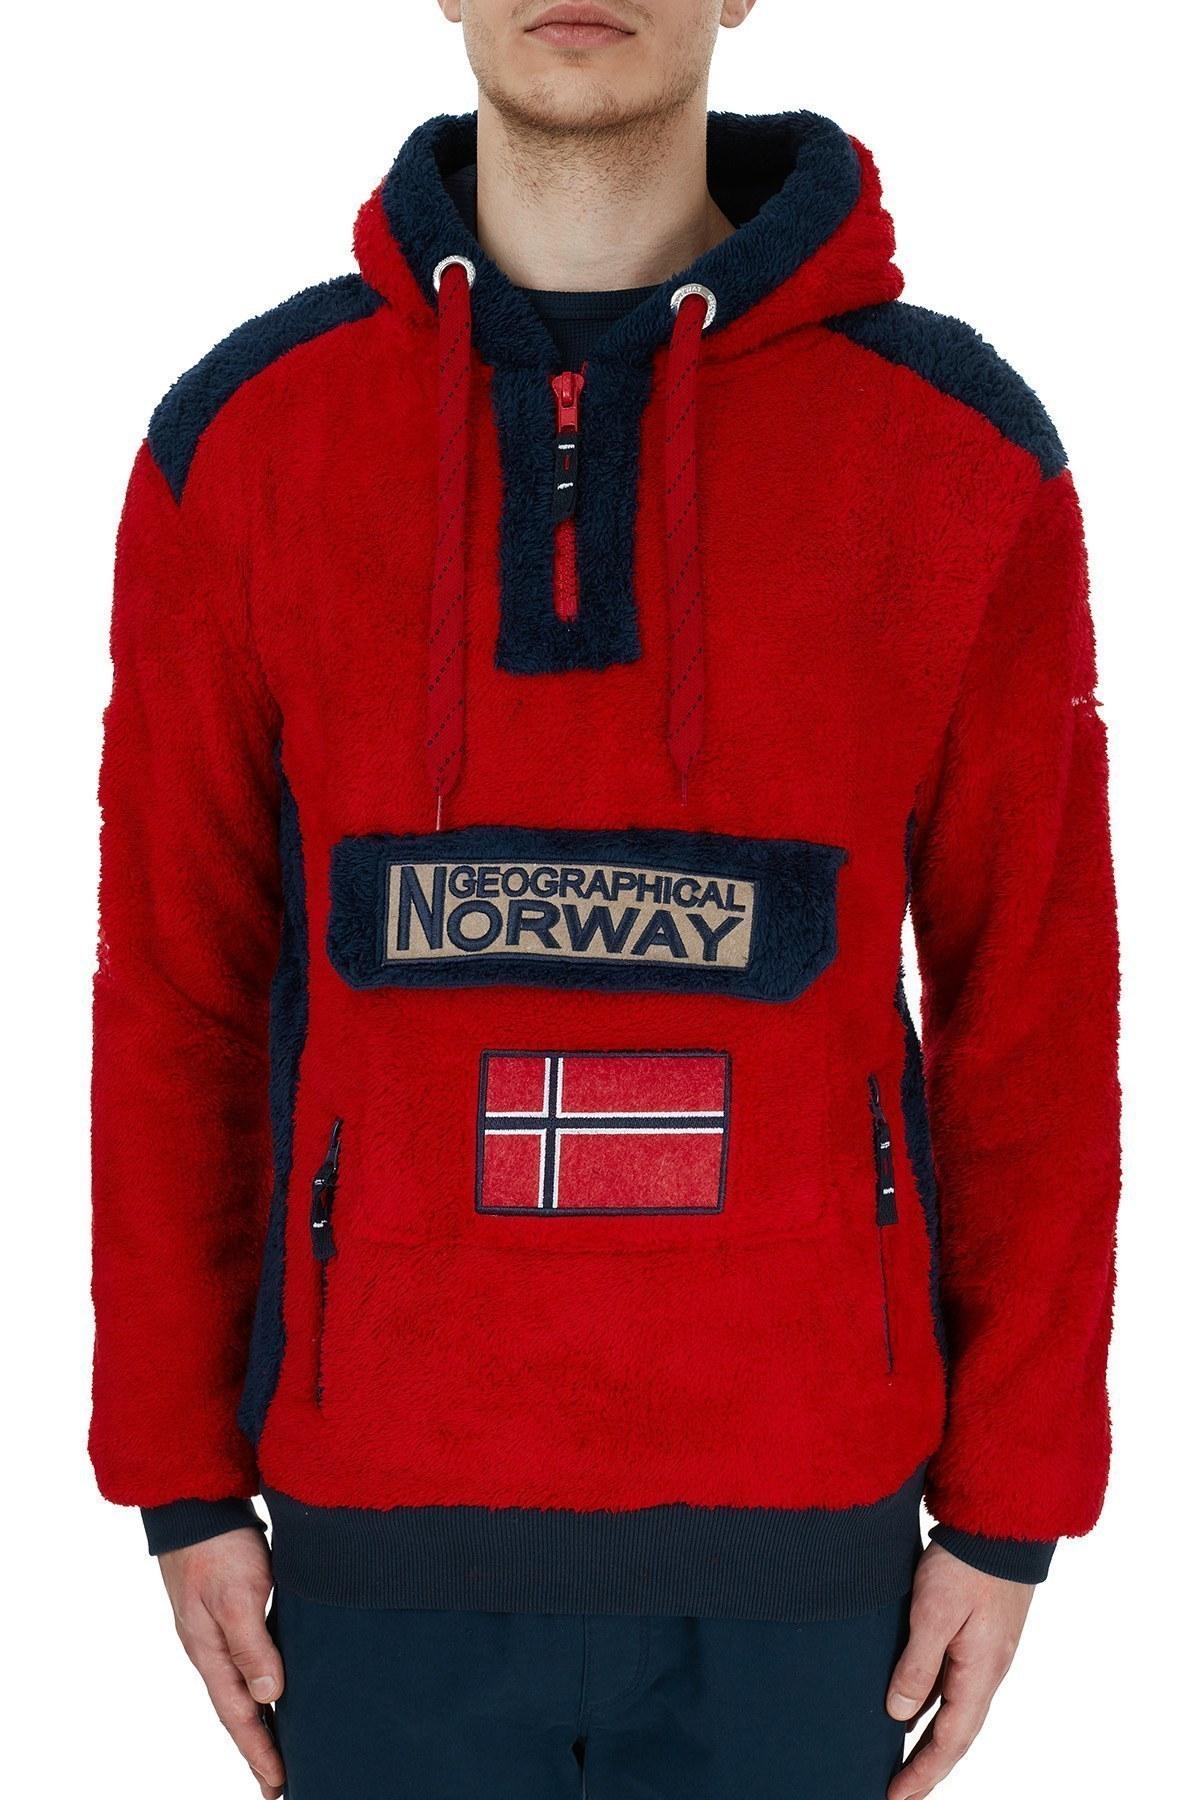 Norway Geographical Kapüşonlu Outdoor Polar Erkek Sweat GYMCLASS E KIRMIZI